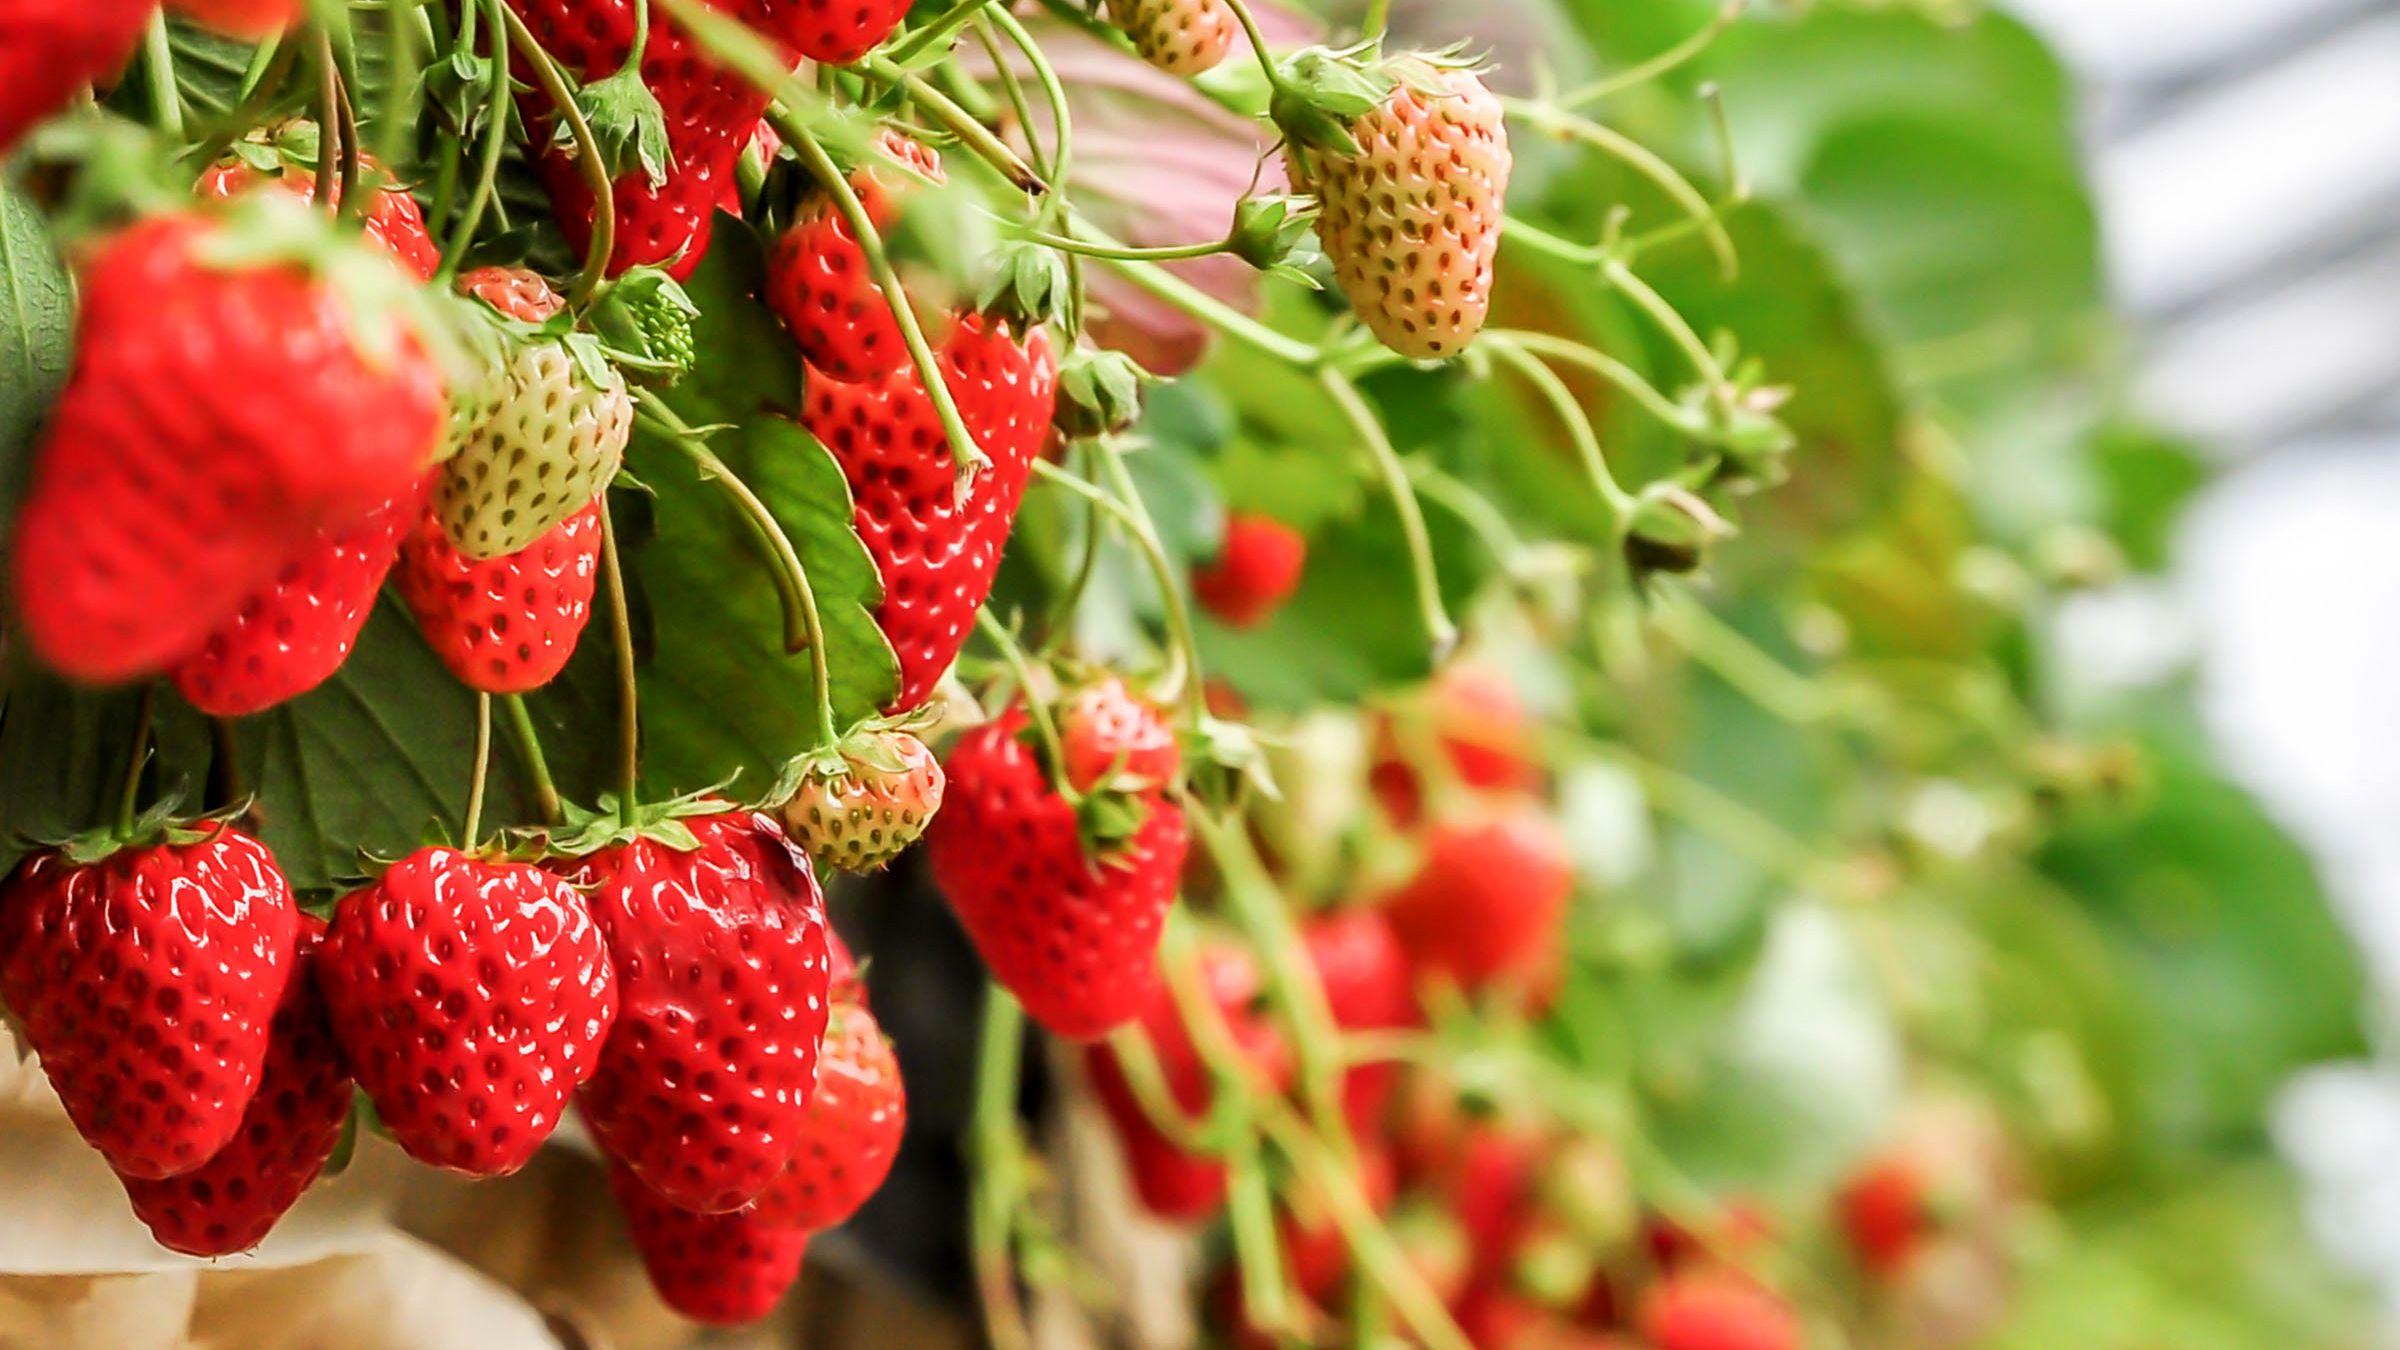 fresh strawberry on the vine